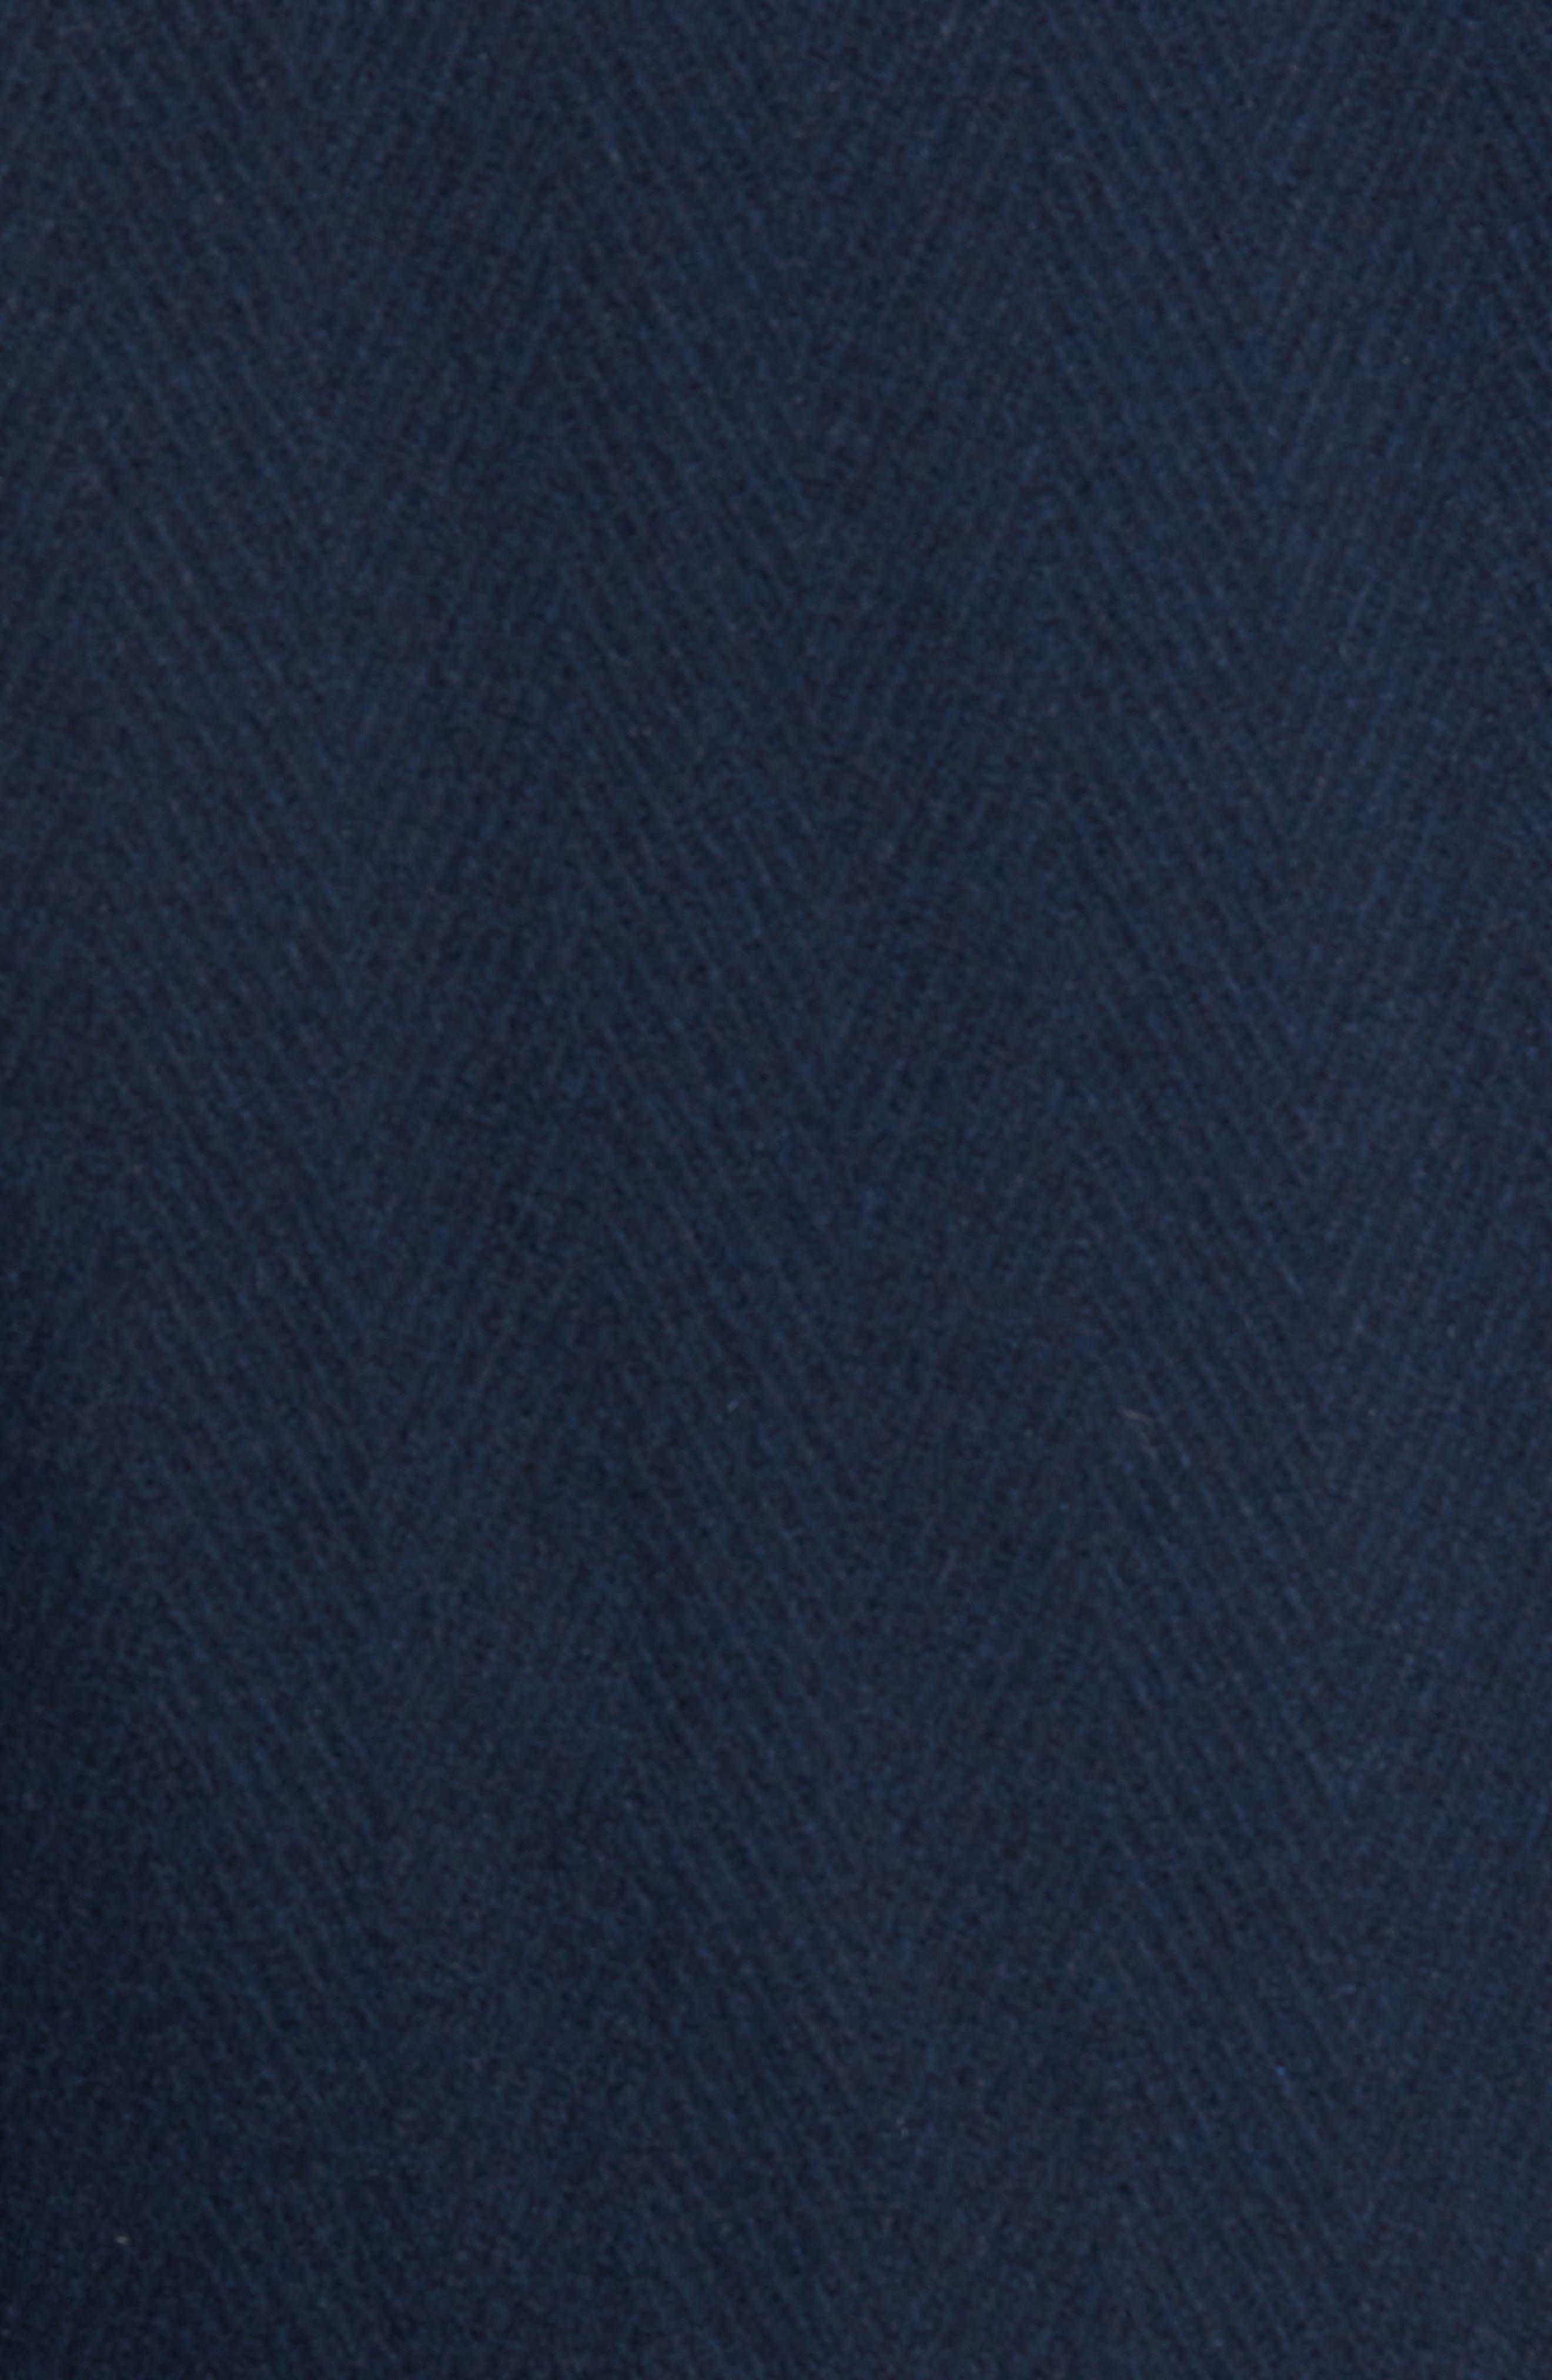 Herringbone Wool Blend Car Coat,                             Alternate thumbnail 11, color,